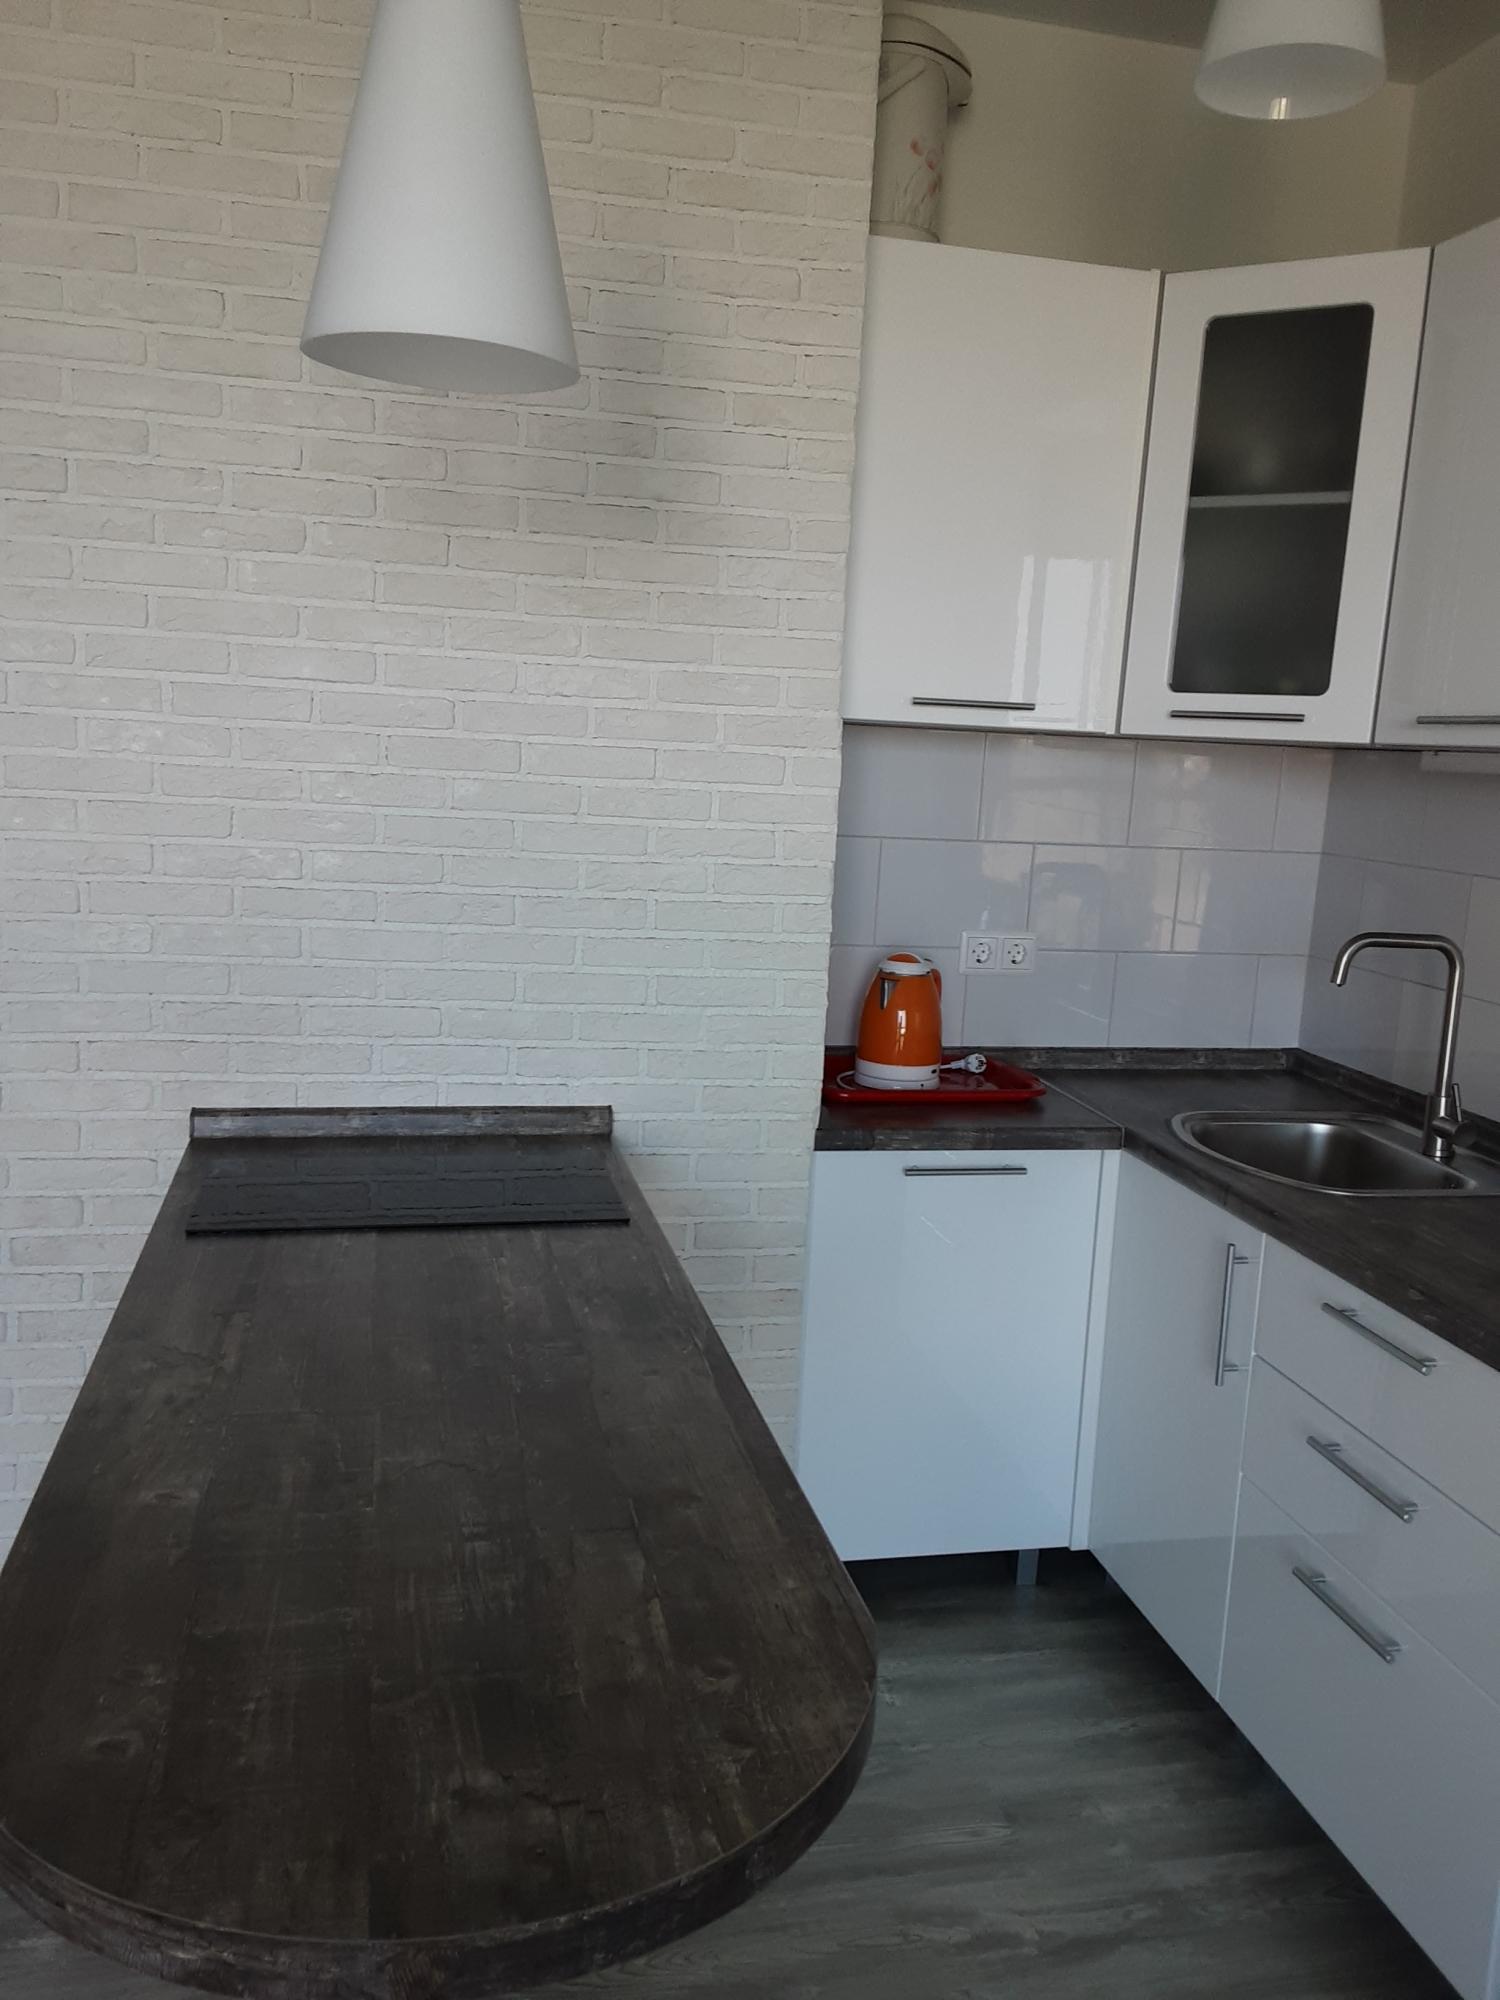 Apartment, Studio, 26 m2 in Lyubertsy 89773577037 buy 5